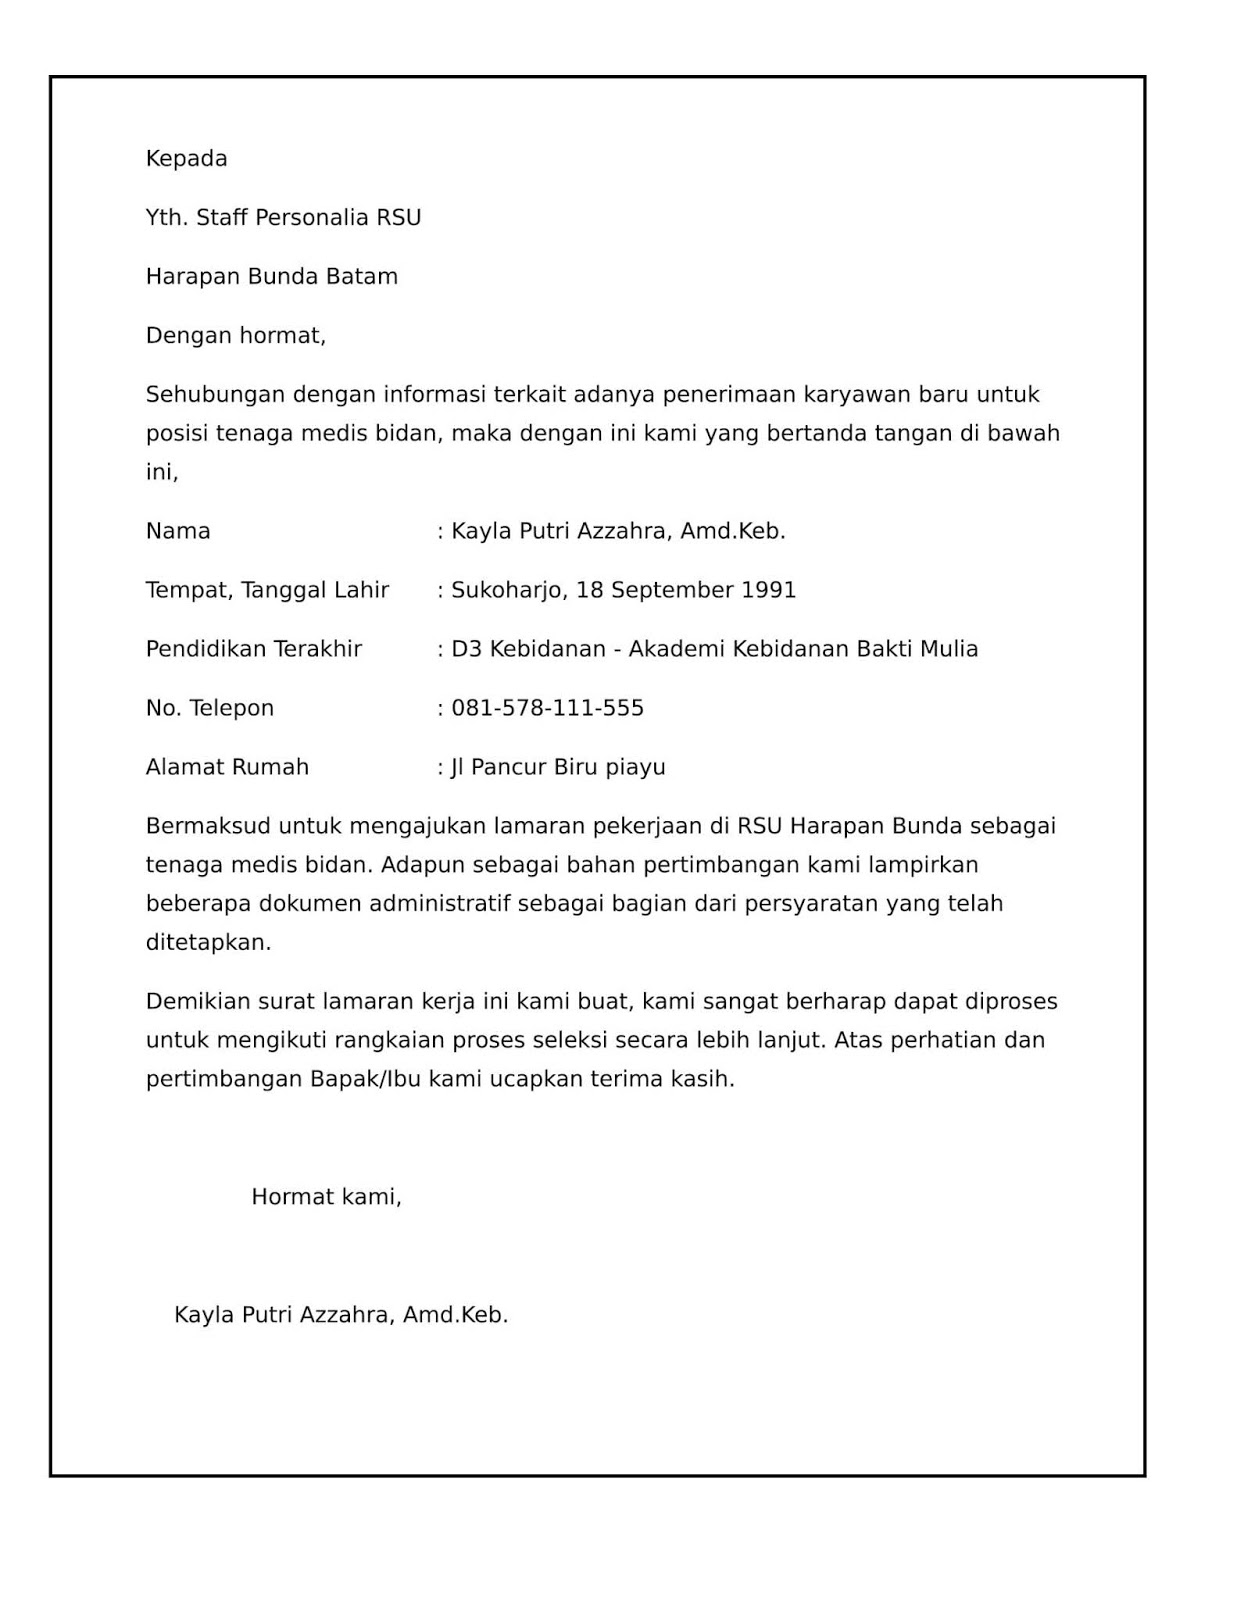 20 Contoh Surat Lamaran Kerja Di Rumah Sakit Terbaru Contoh Surat